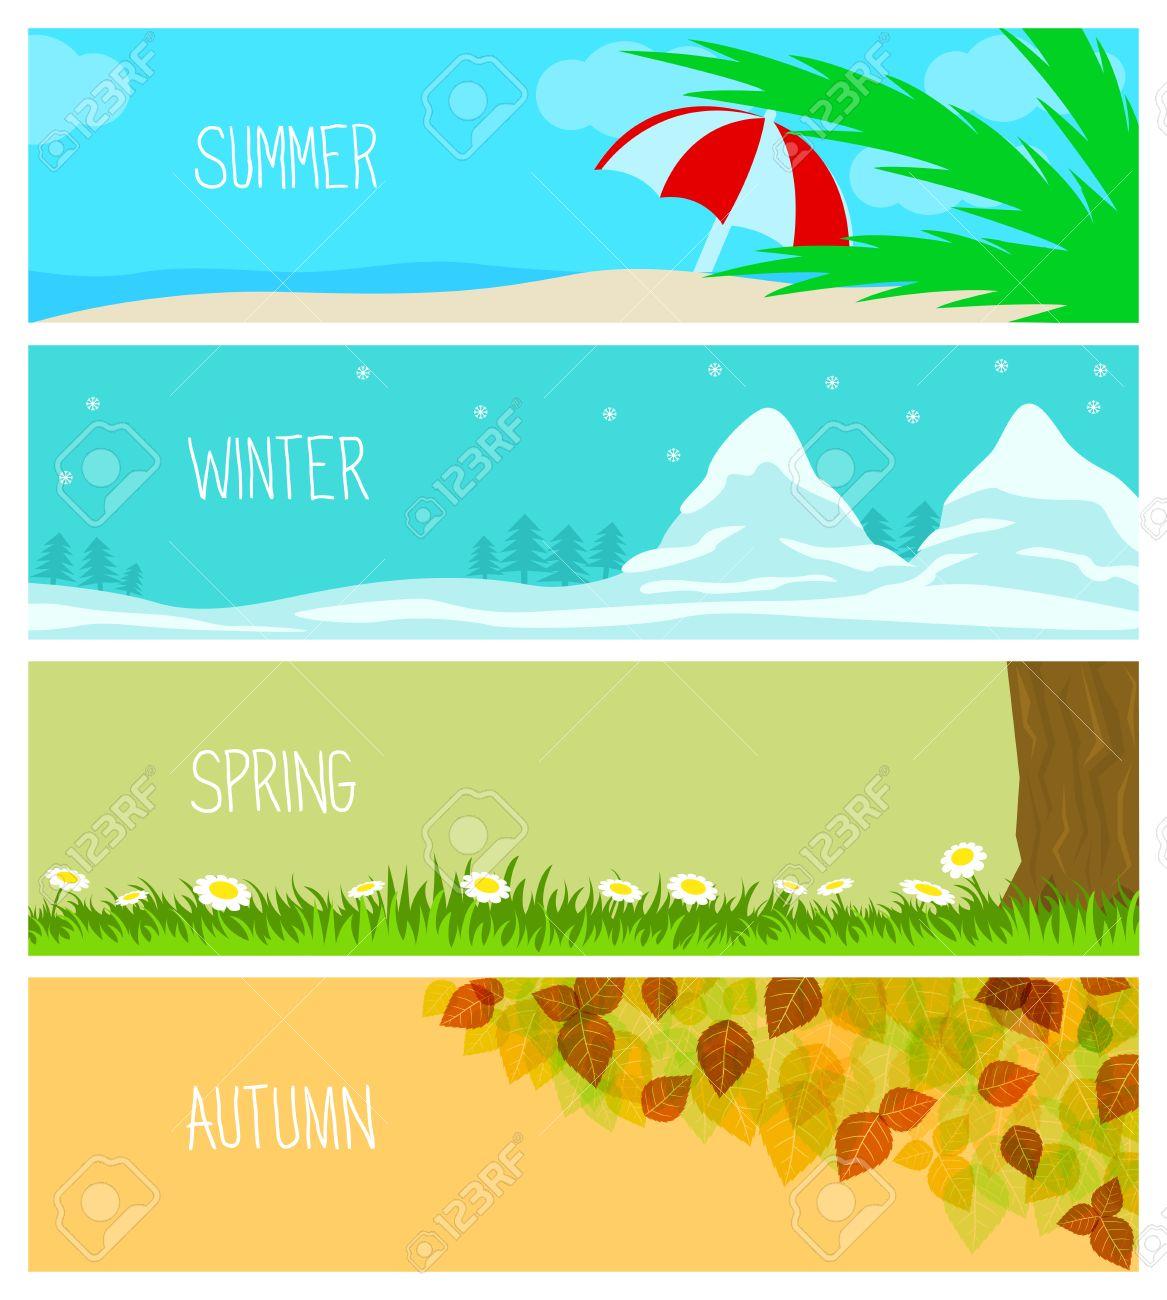 7f1eb5161d23 Estaciones, fondos, verano, invierno, primavera, otoño